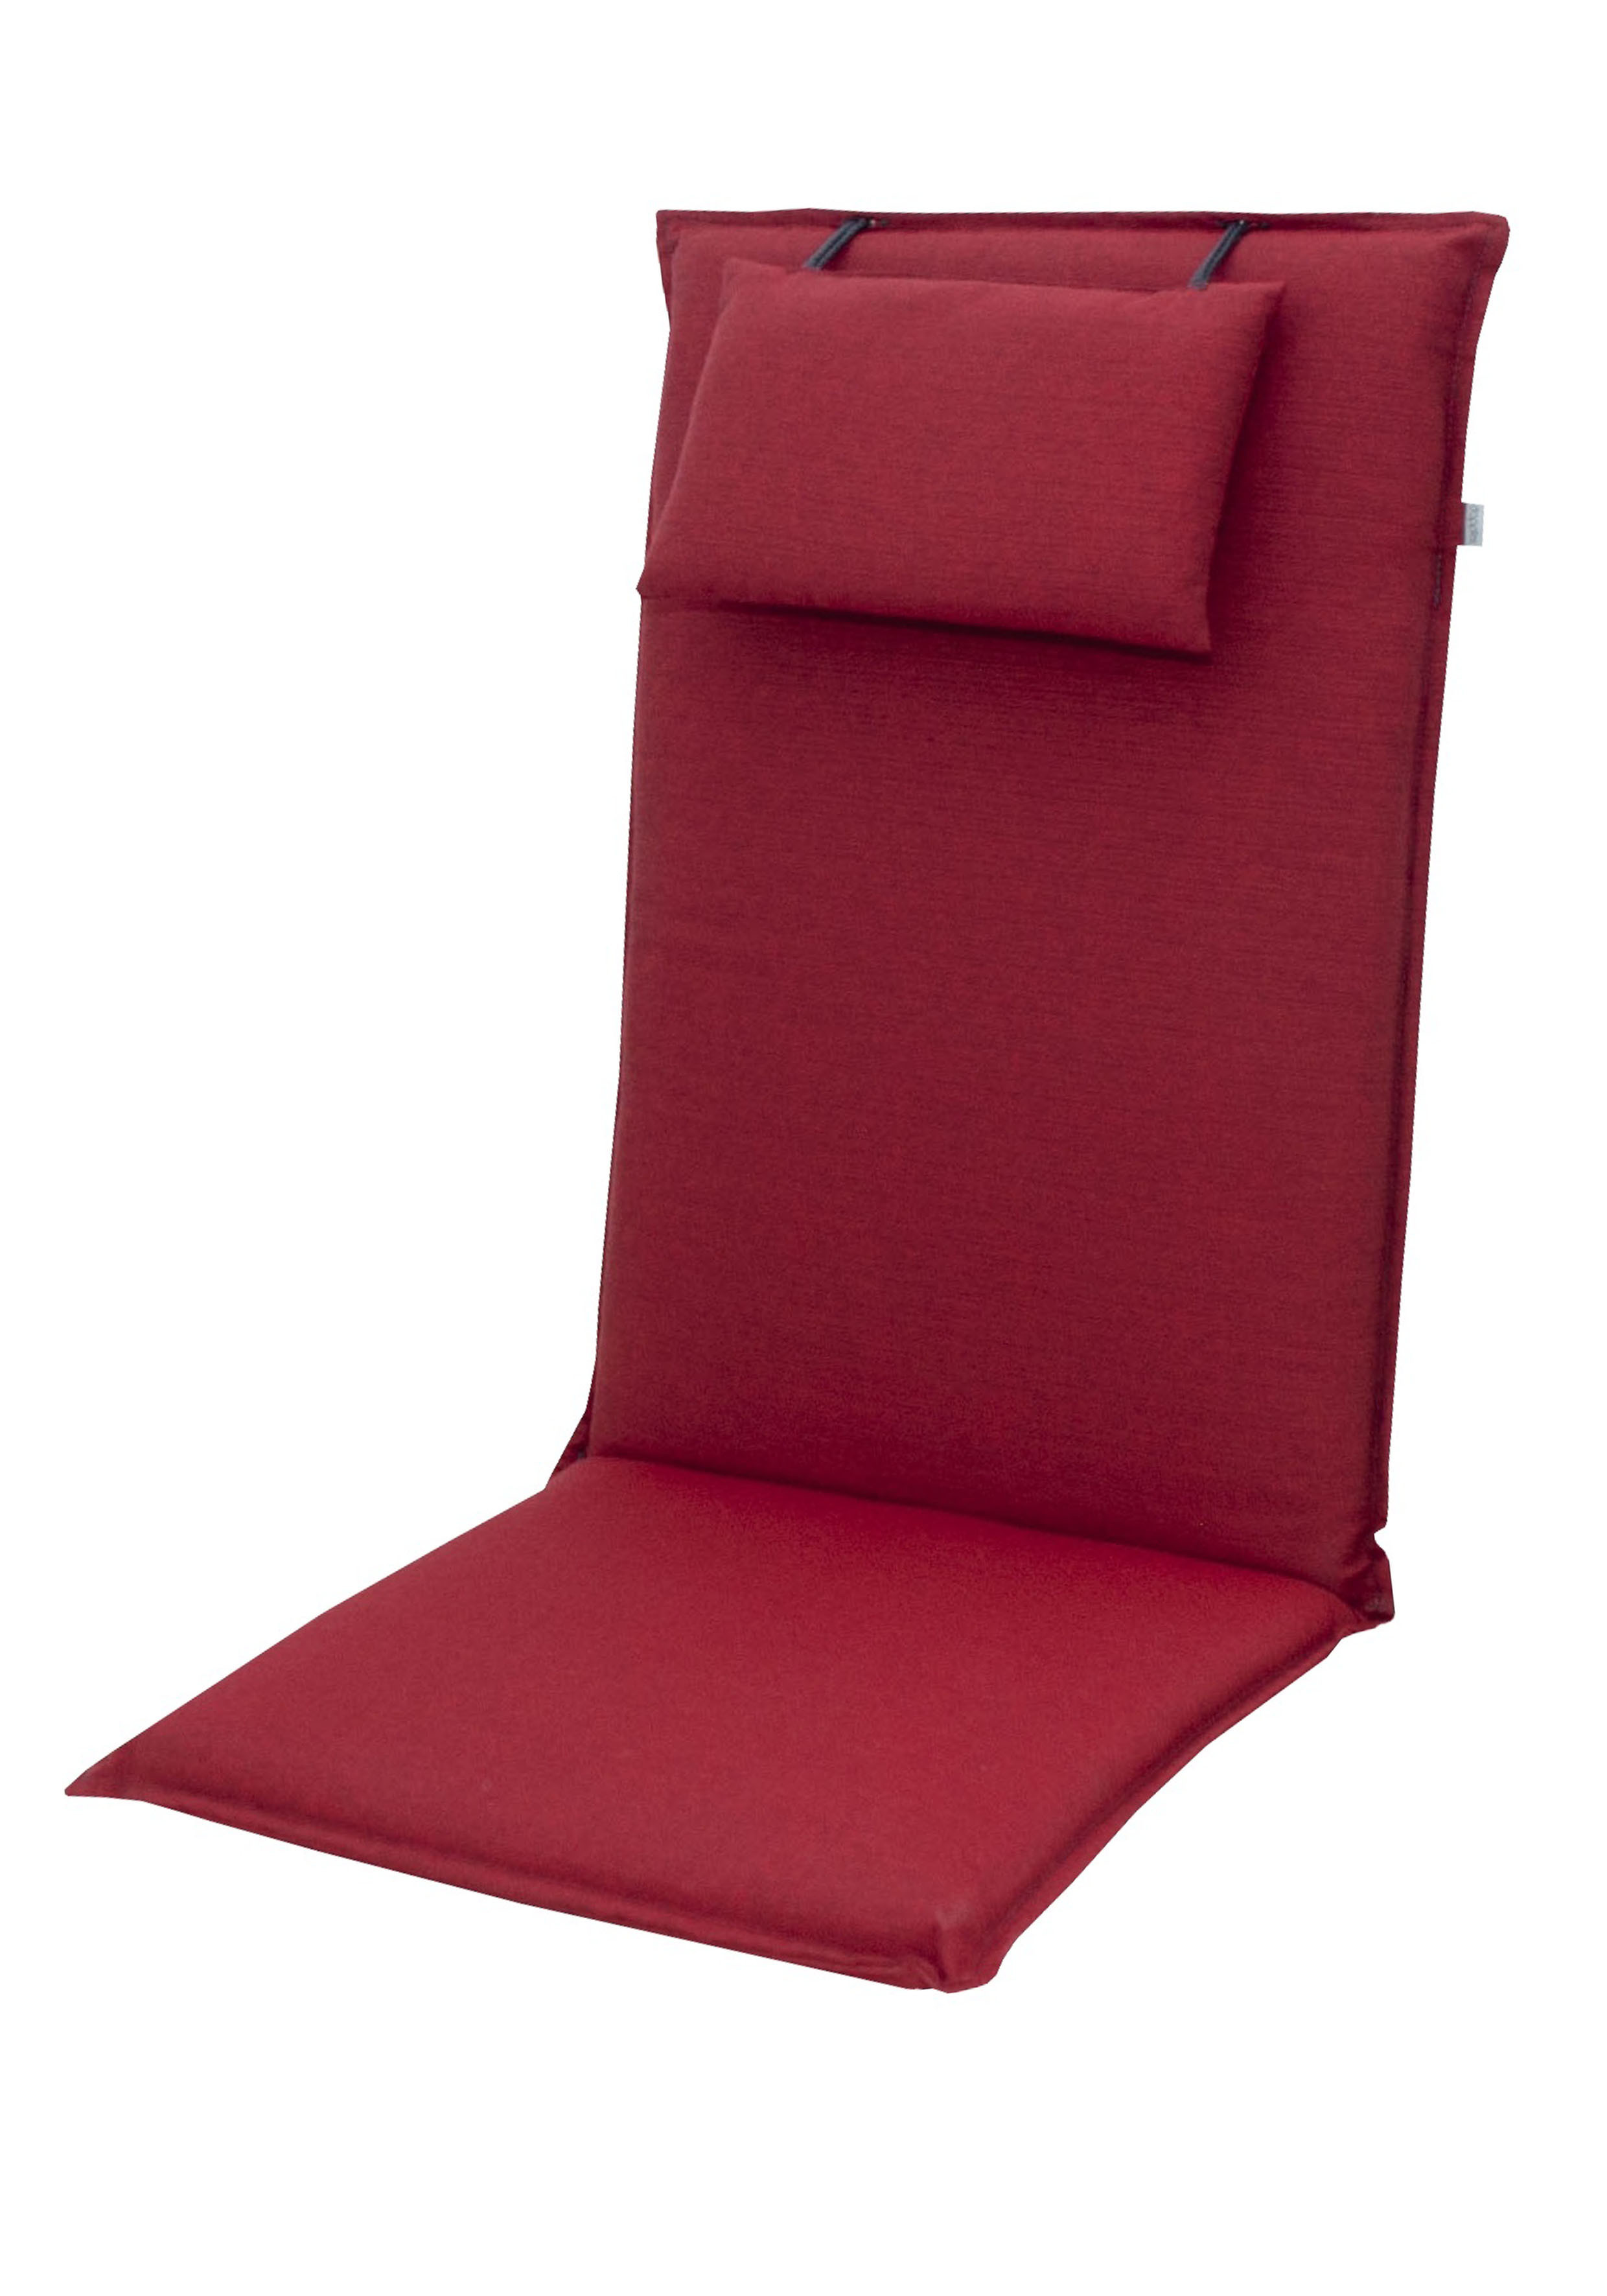 ELEGANT 2428 vysoký - polstr na židli a křeslo s podhlavníkem